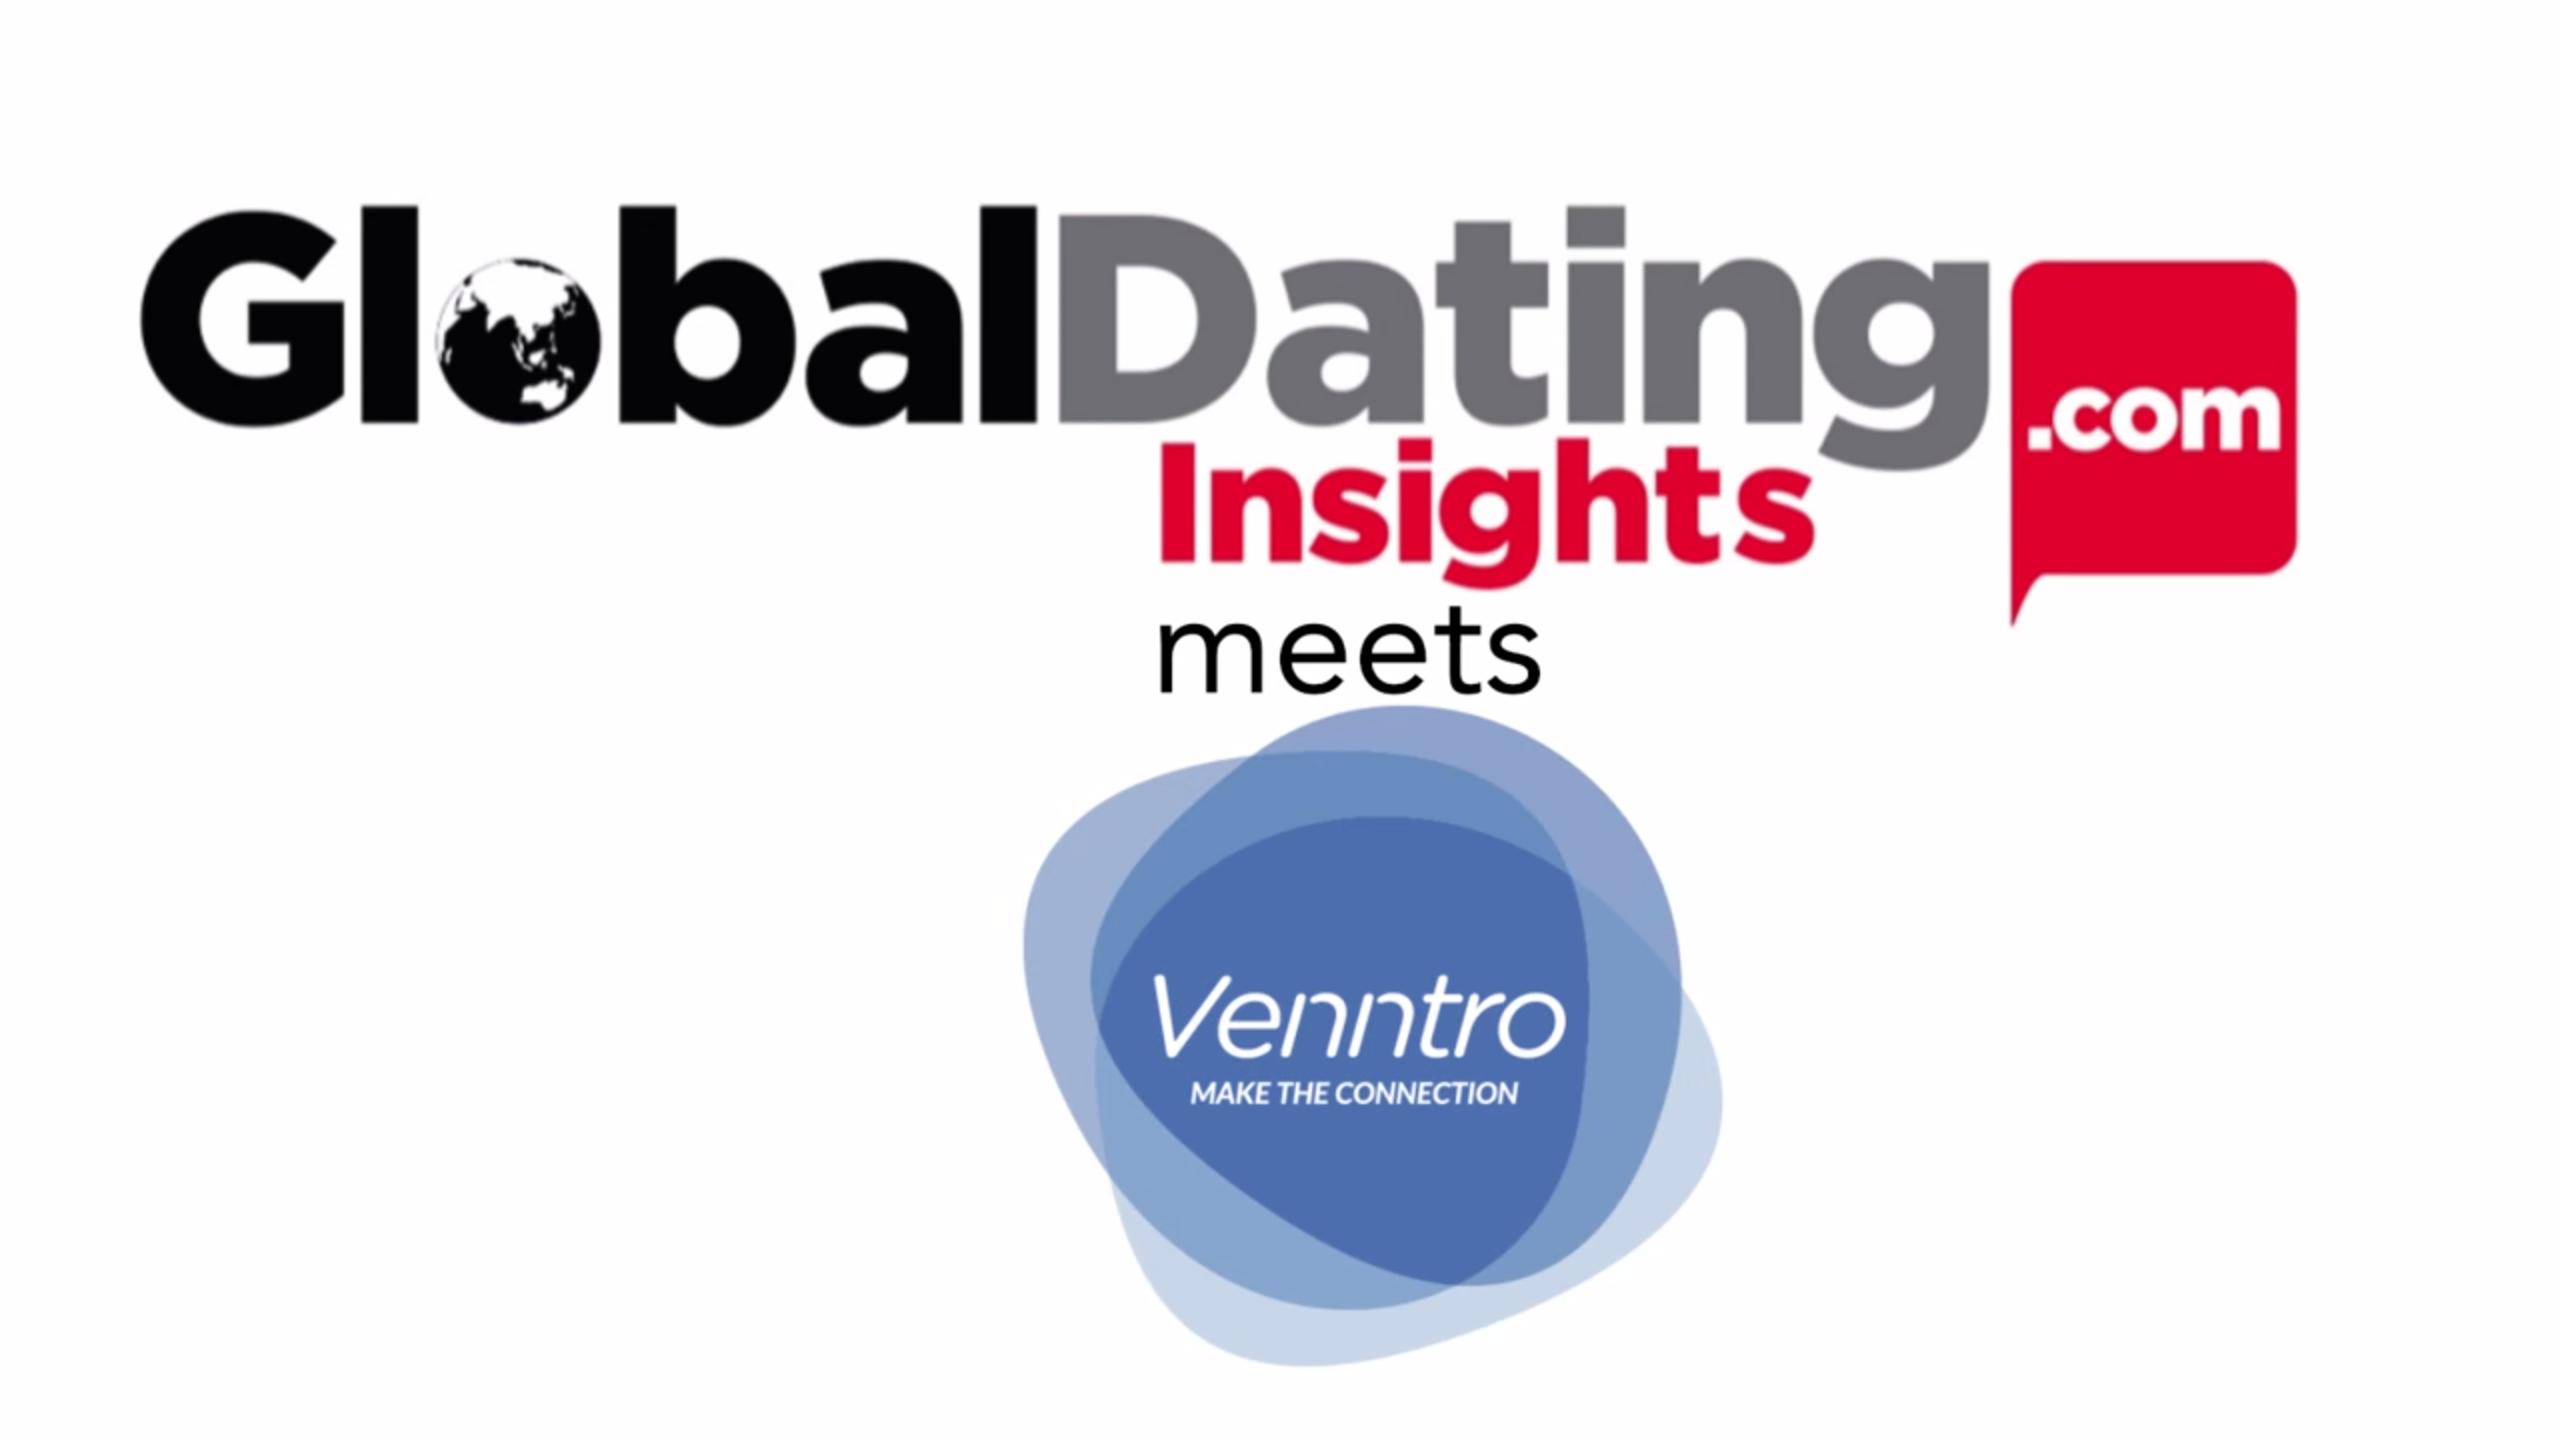 Venntro media group contact details